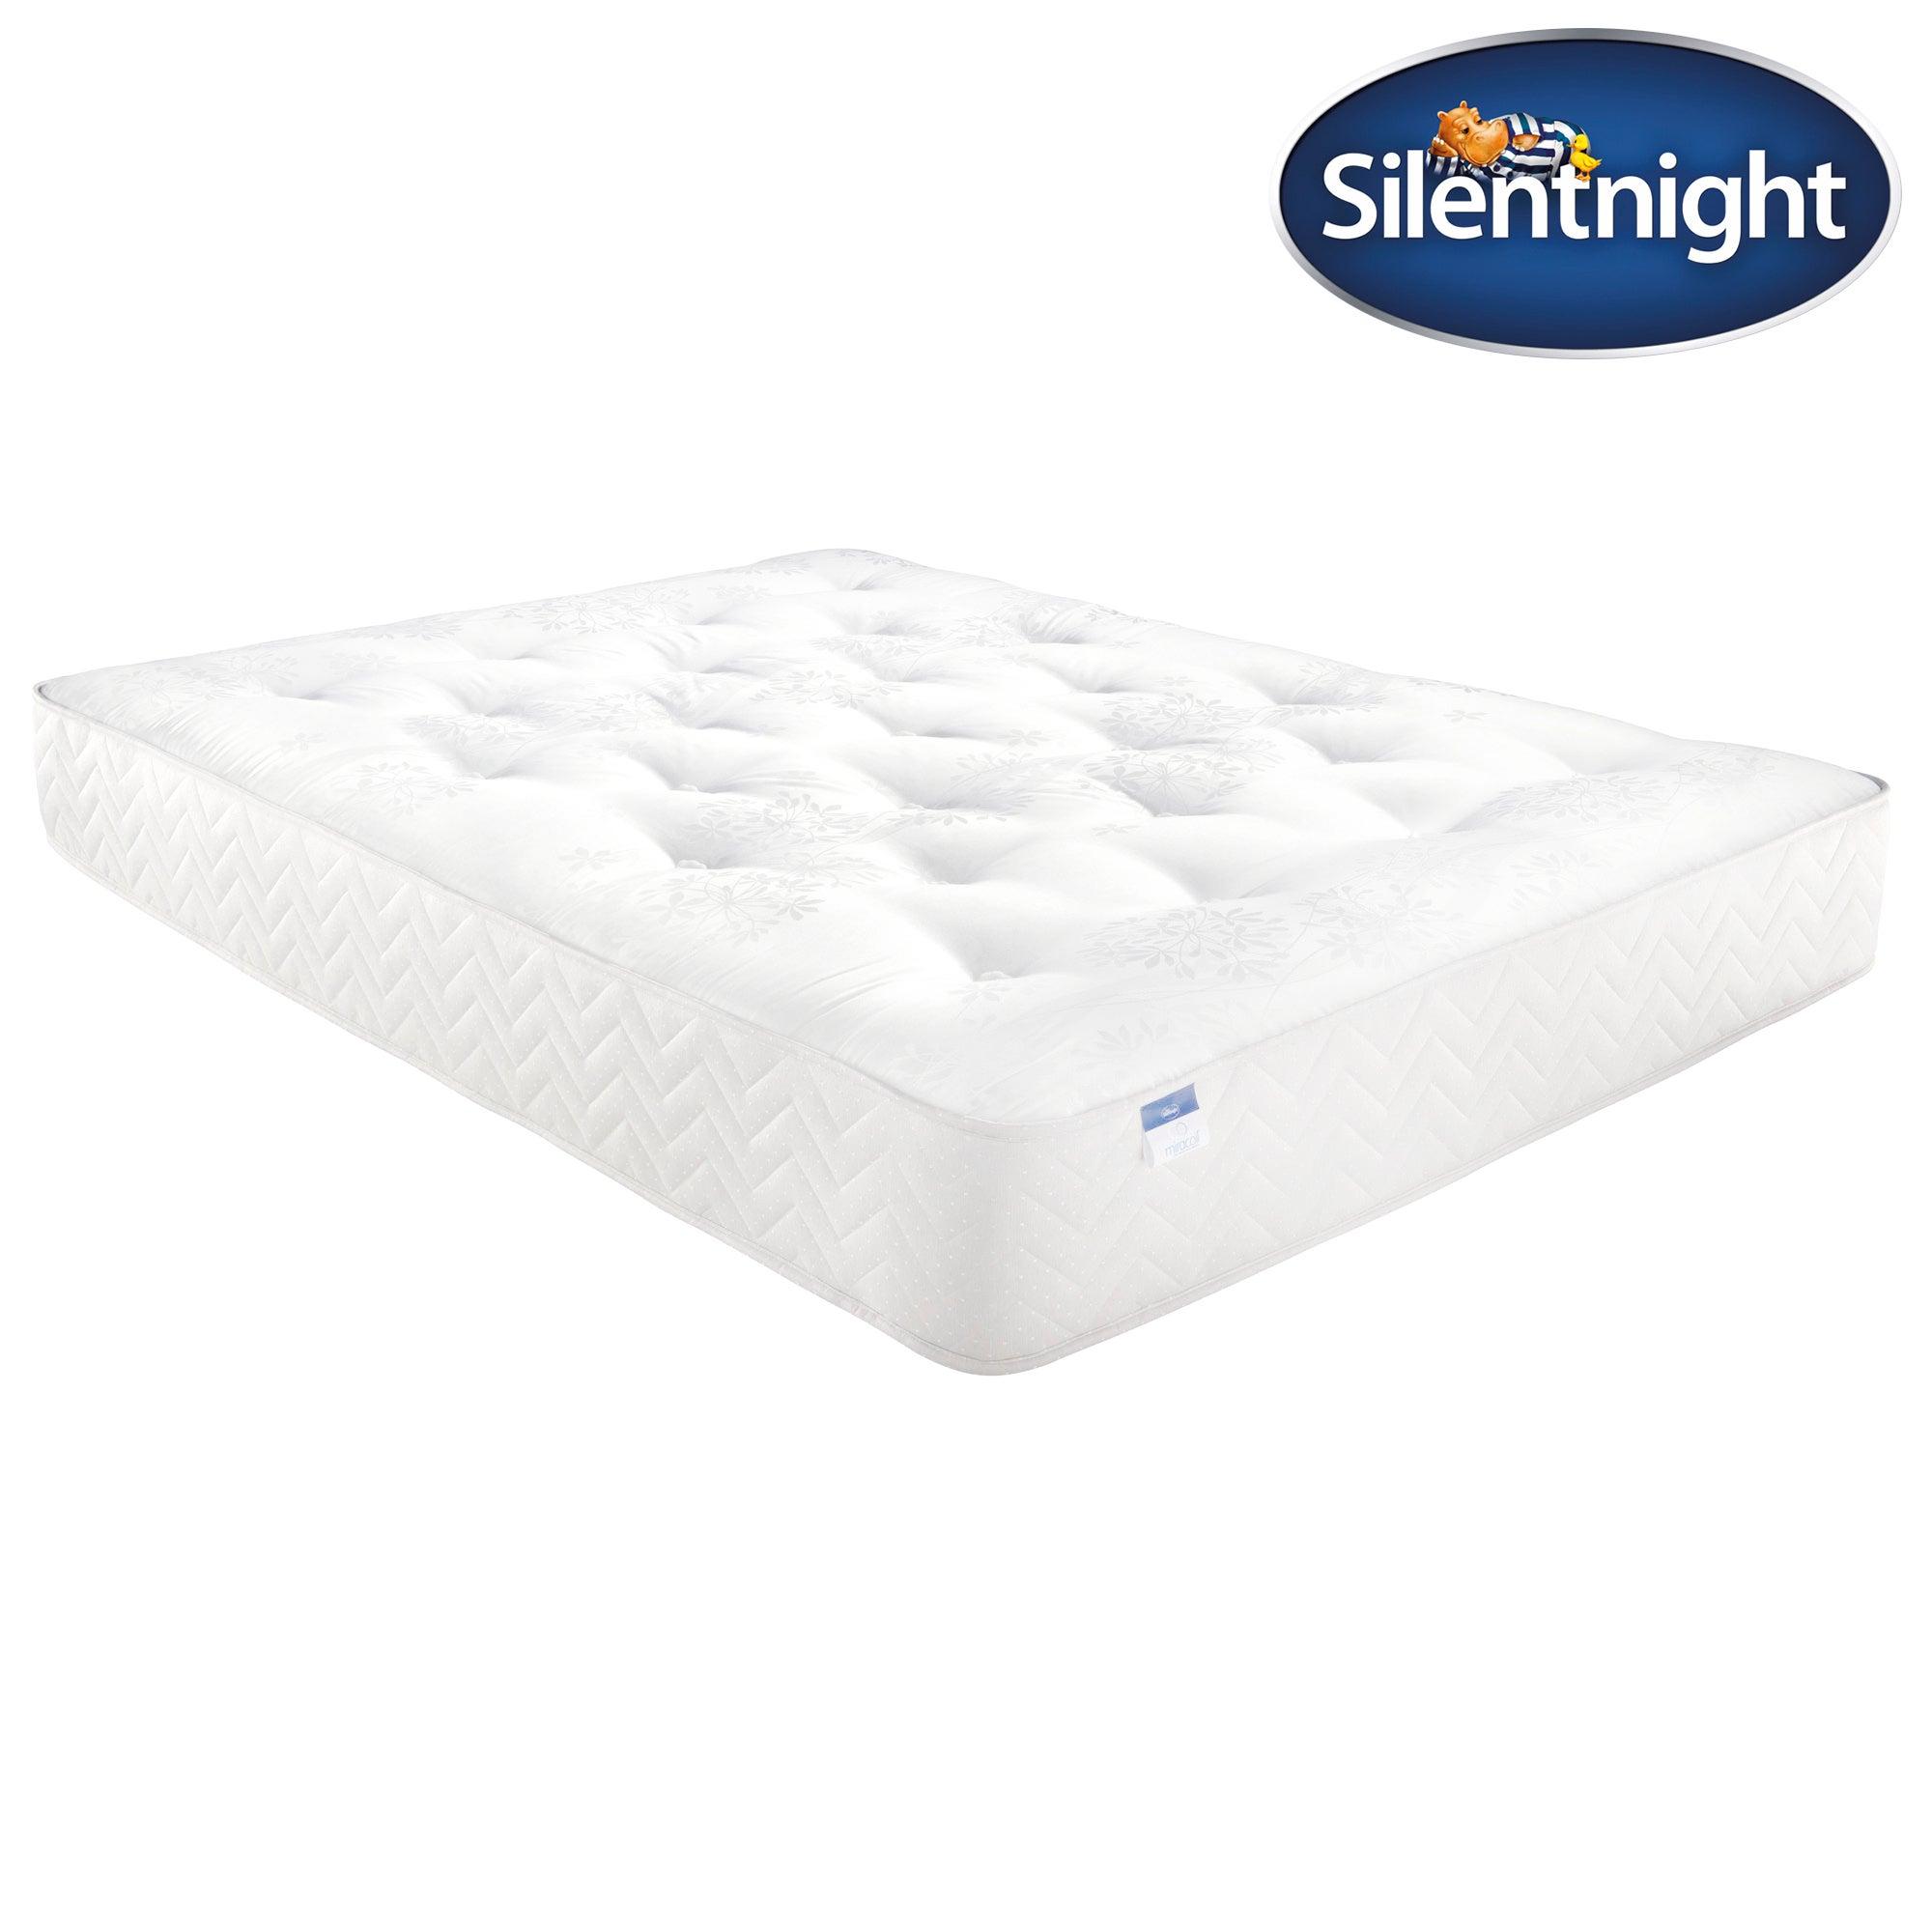 Silentnight Chelsea Mattress